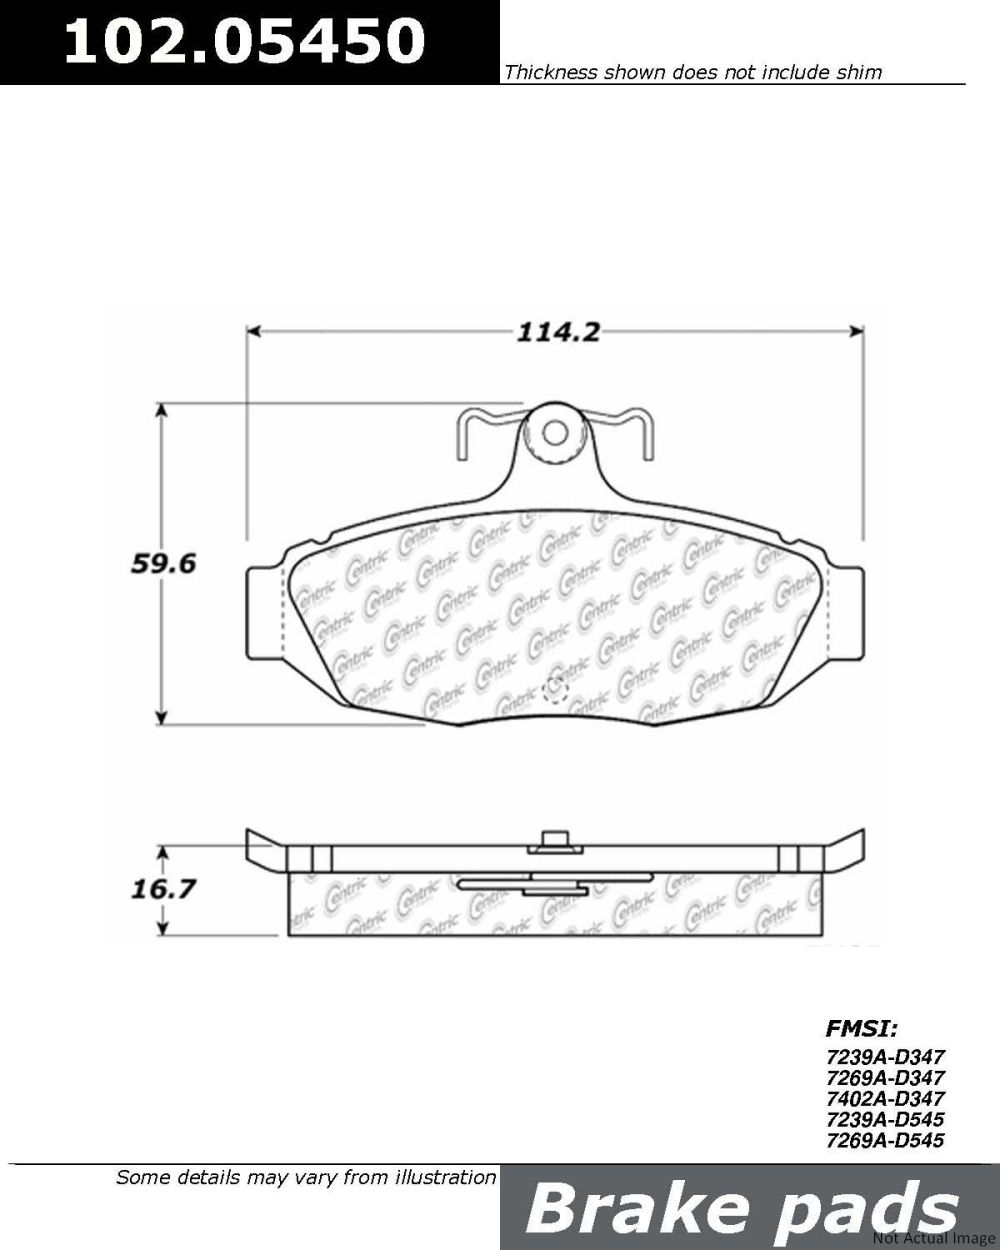 medium resolution of  1990 ford thunderbird disc brake pad set ce 102 05450